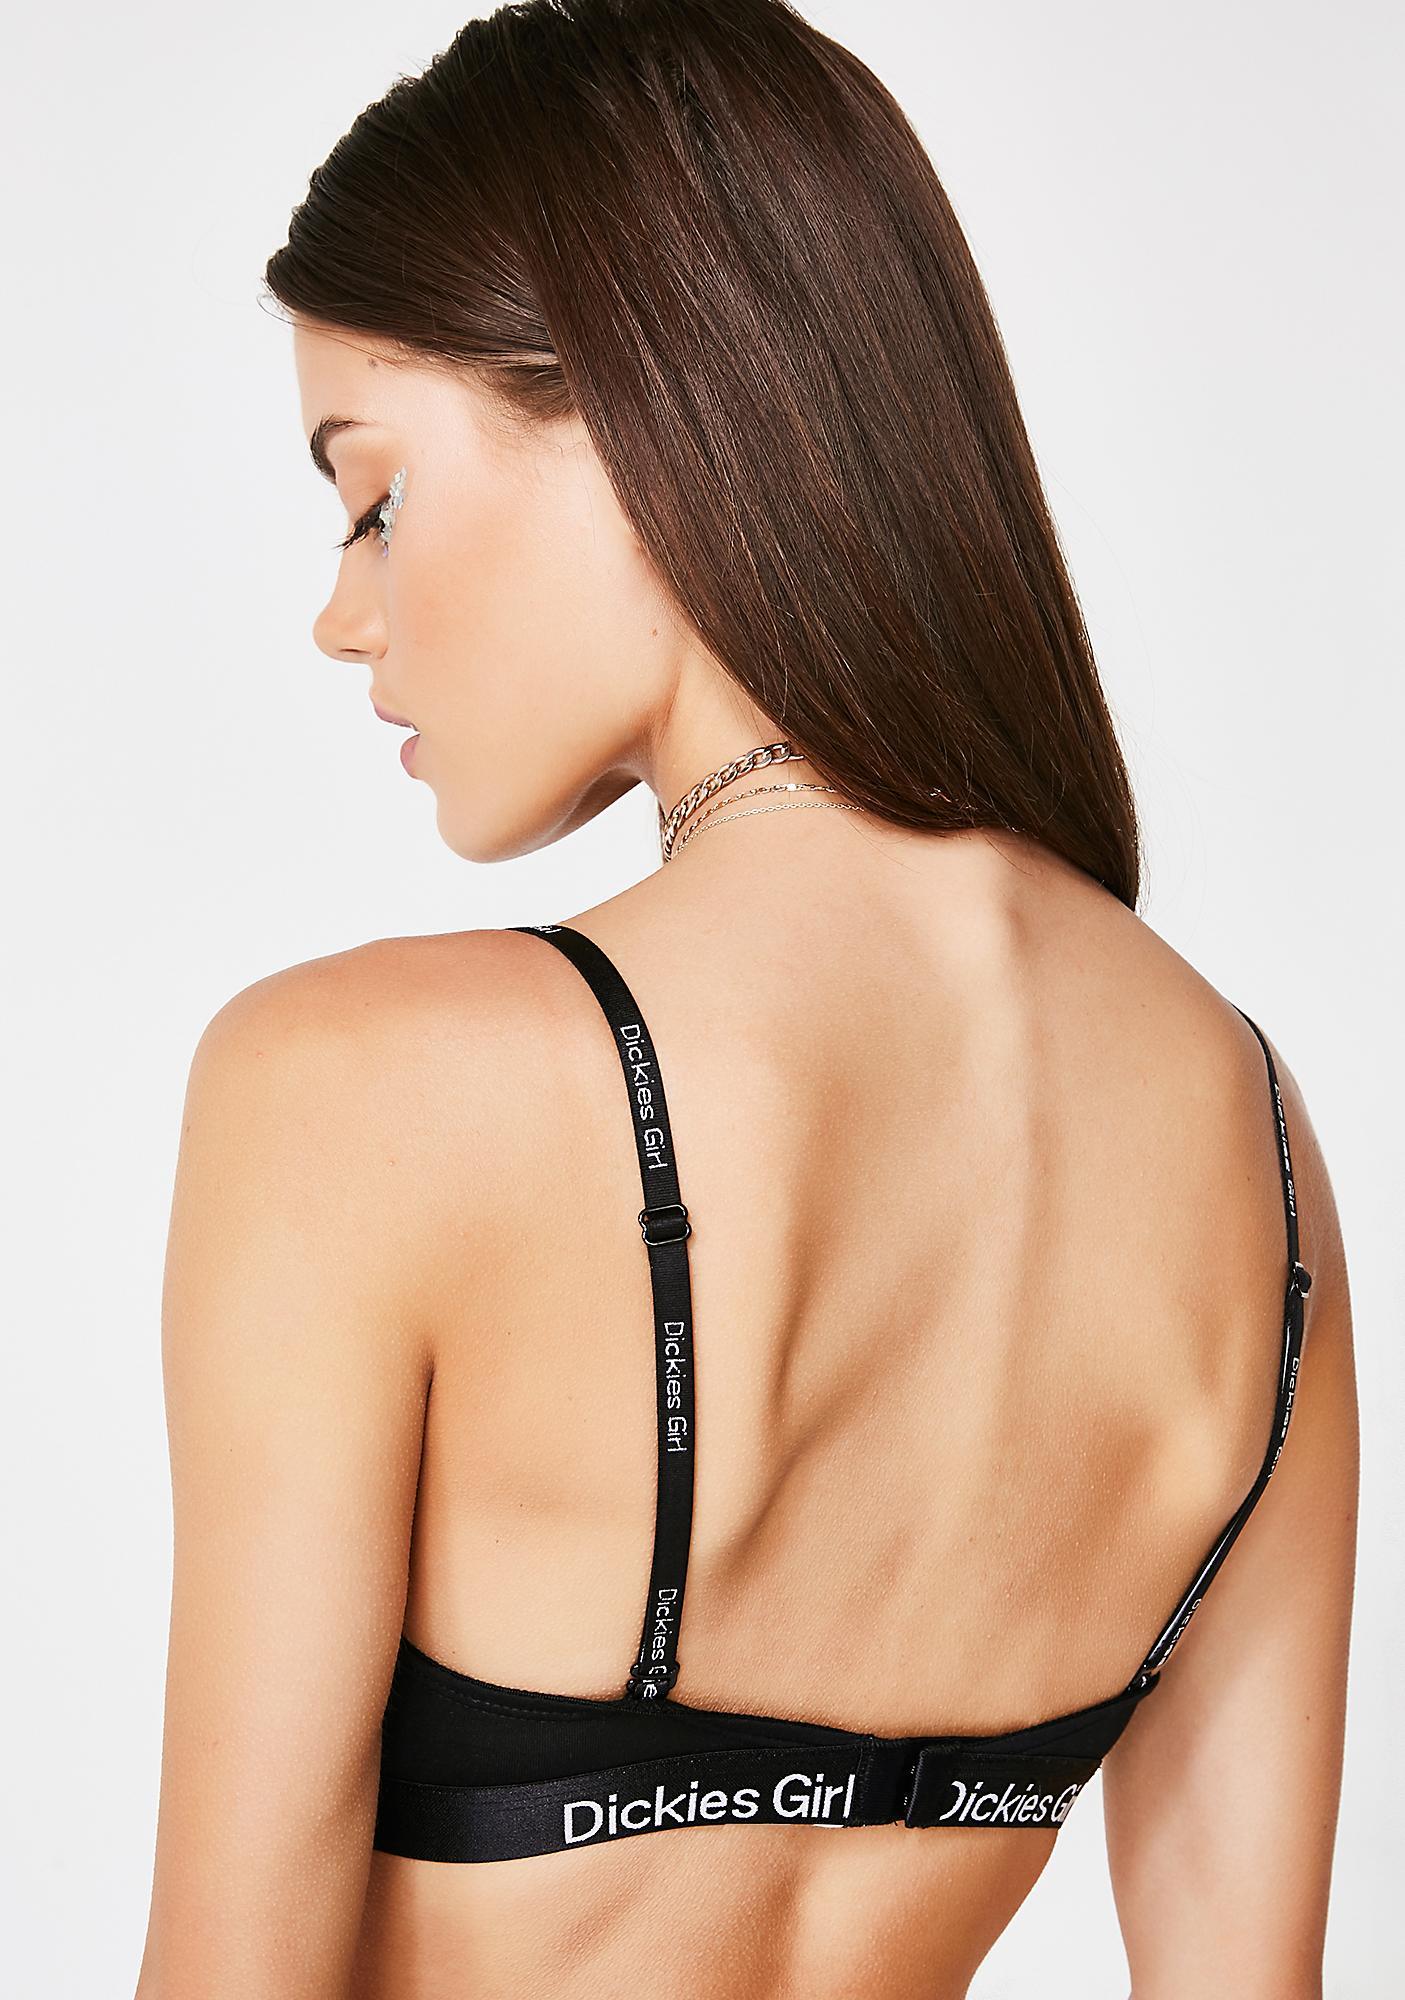 Dickies Girl Wicked Triangle Bra N Bikini Set